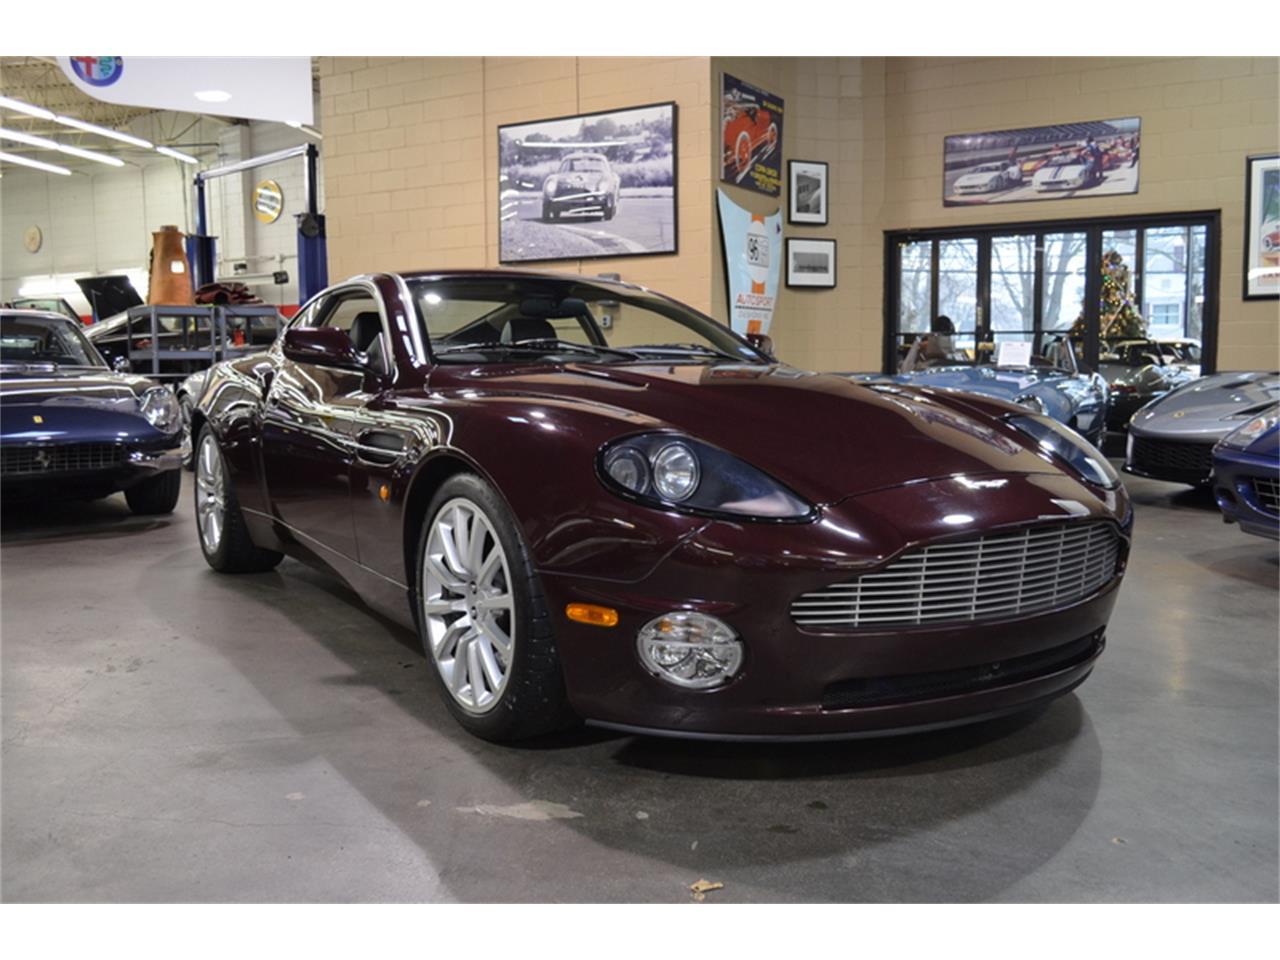 2003 Aston Martin Vanquish For Sale Classiccars Com Cc 1052375